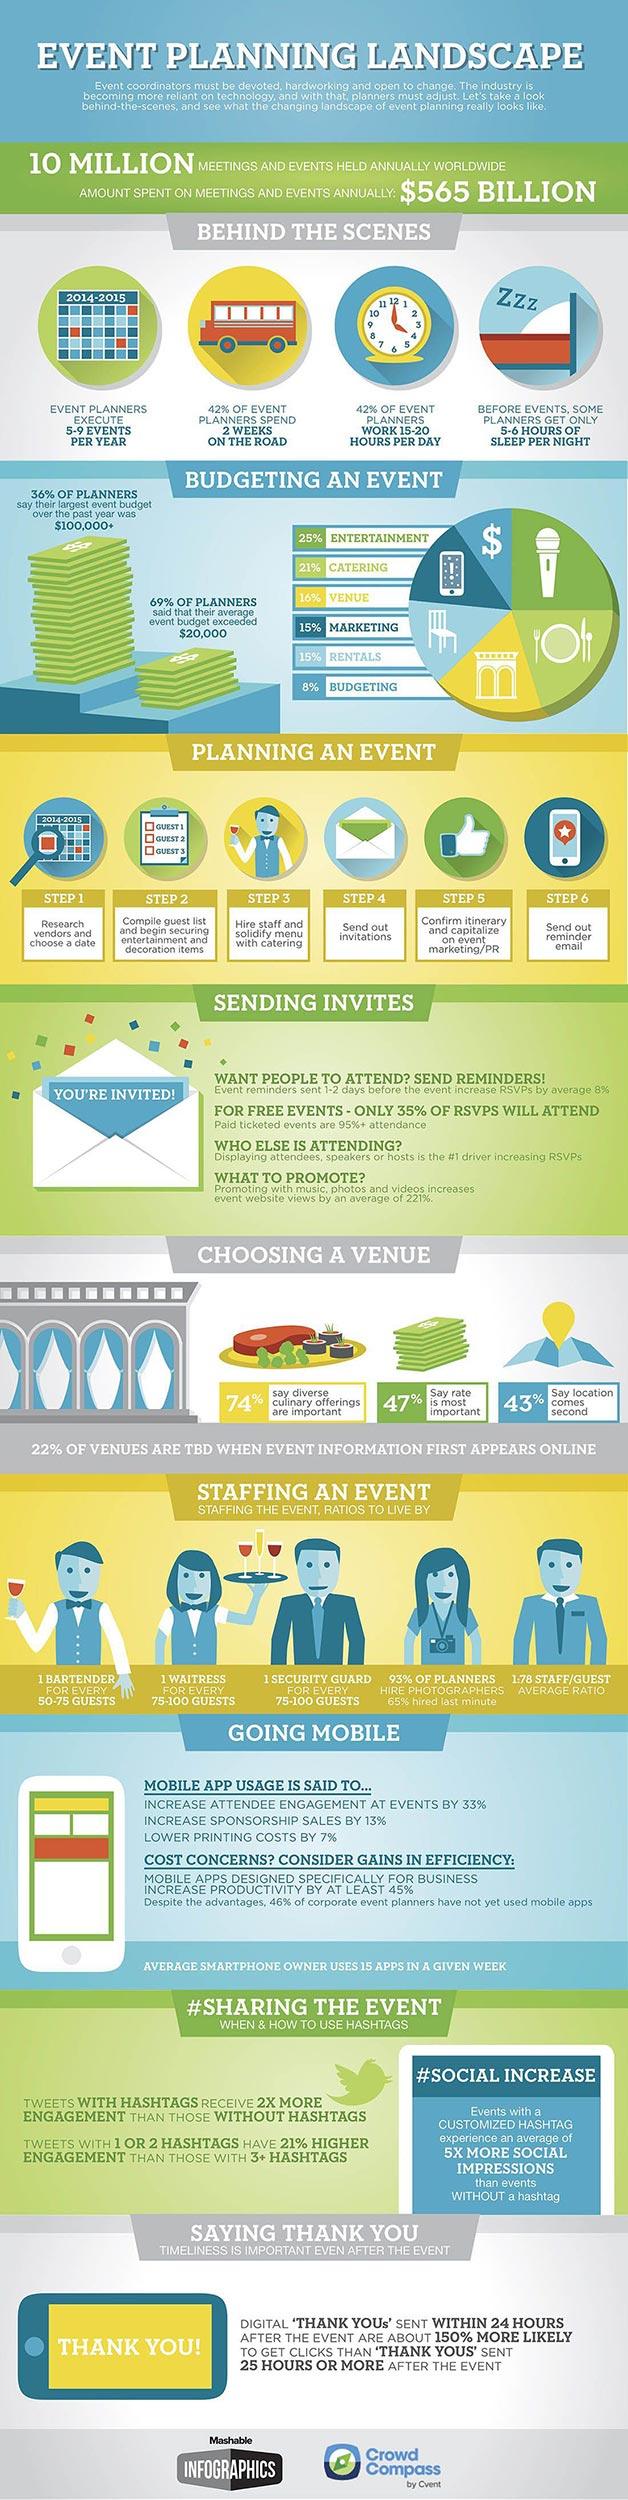 event planning landscape